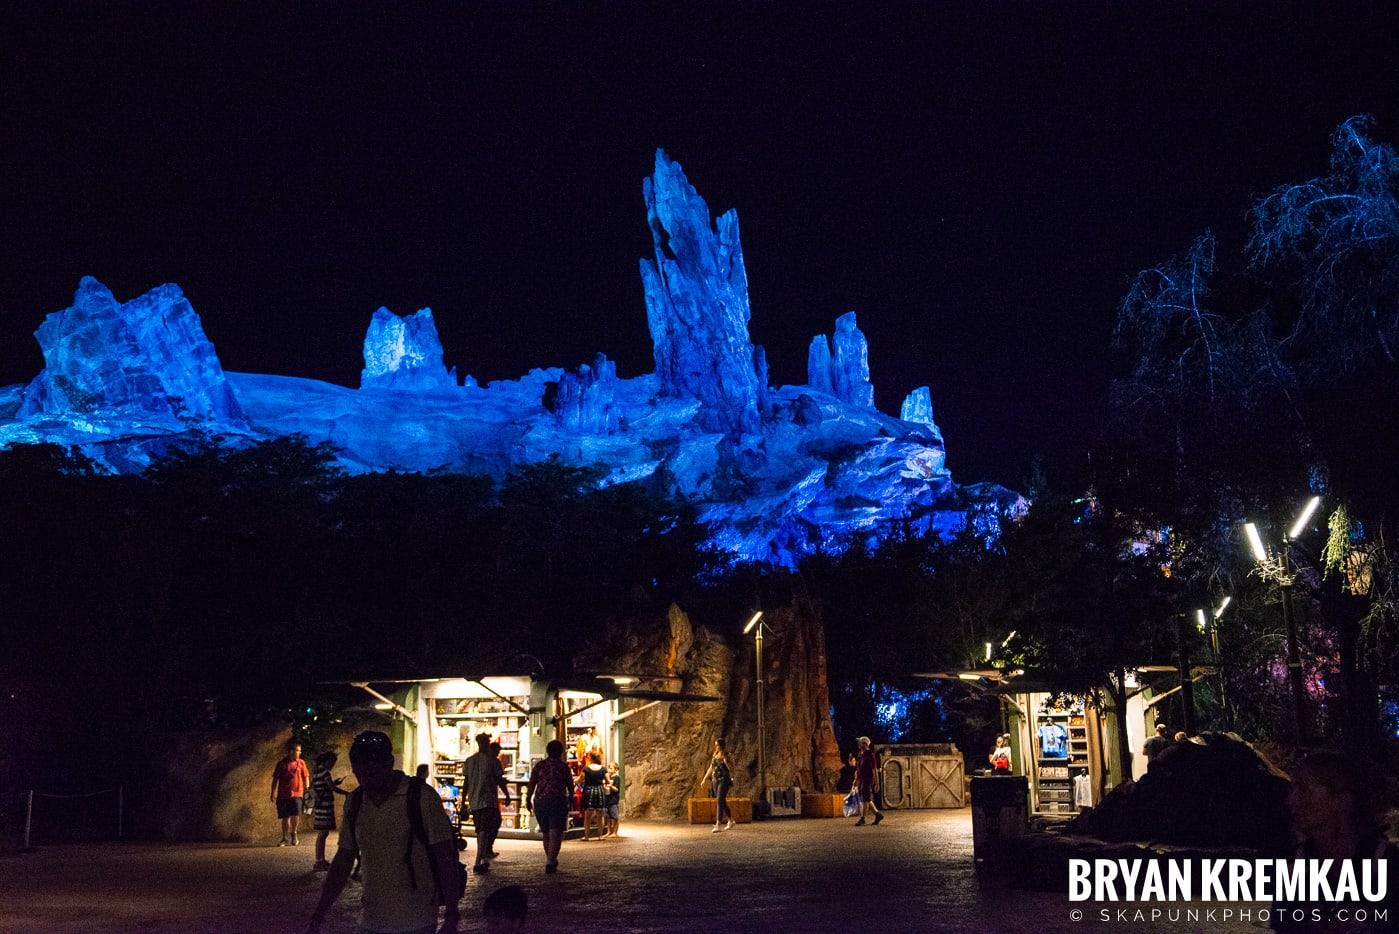 Walt Disney World Vacation: Day 6 (Magic Kingdom, Epcot, Disney's Hollywood Studios) - 10.4.19 (29)